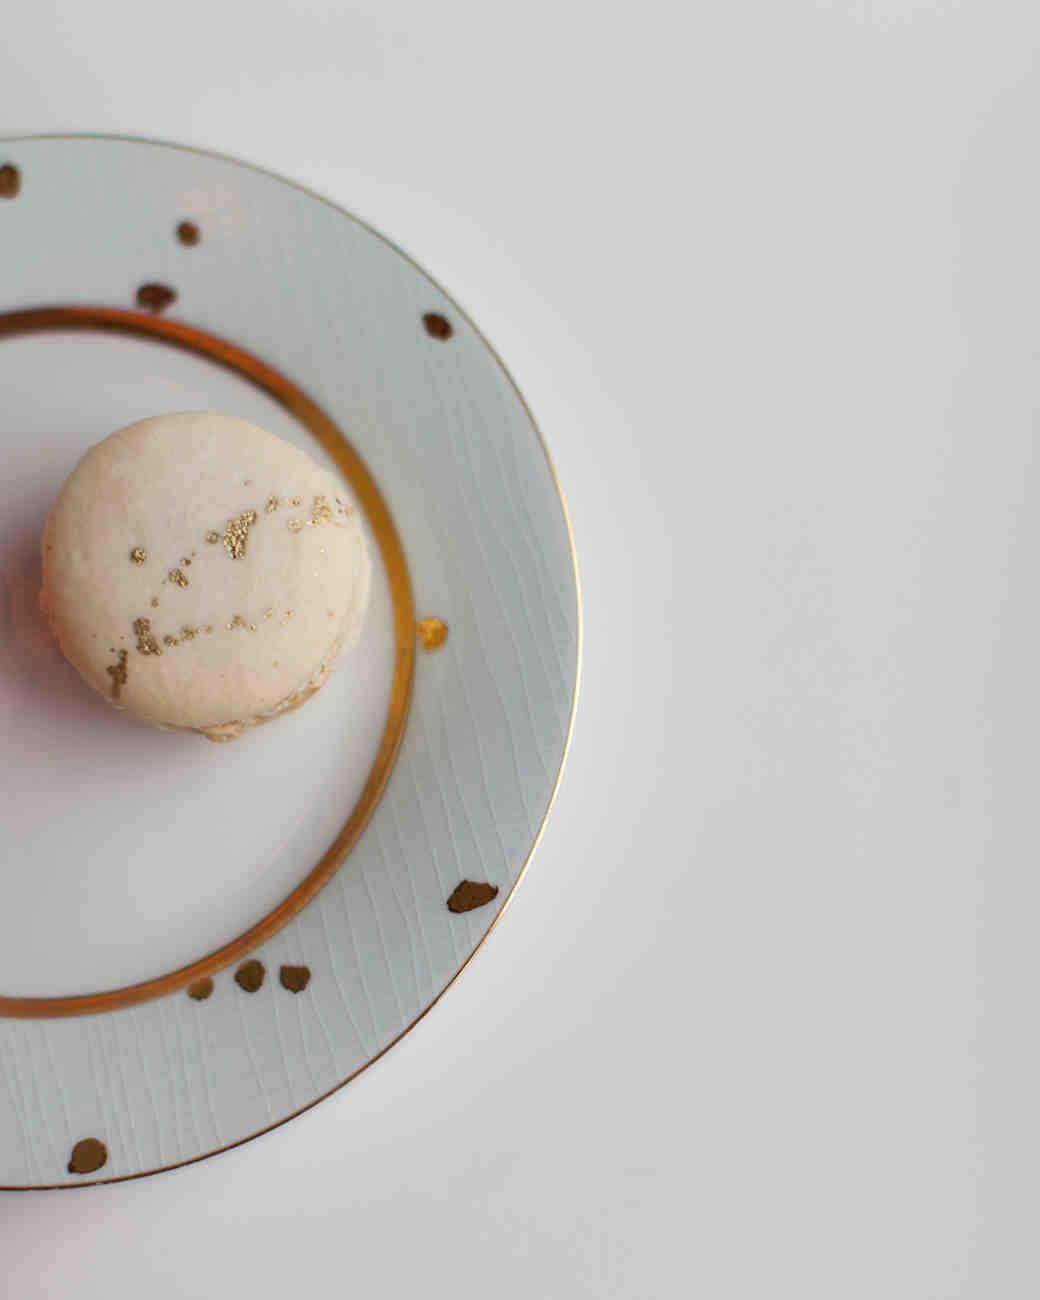 ashley-ryan-wedding-macaron-6544-s111852-0415.jpg